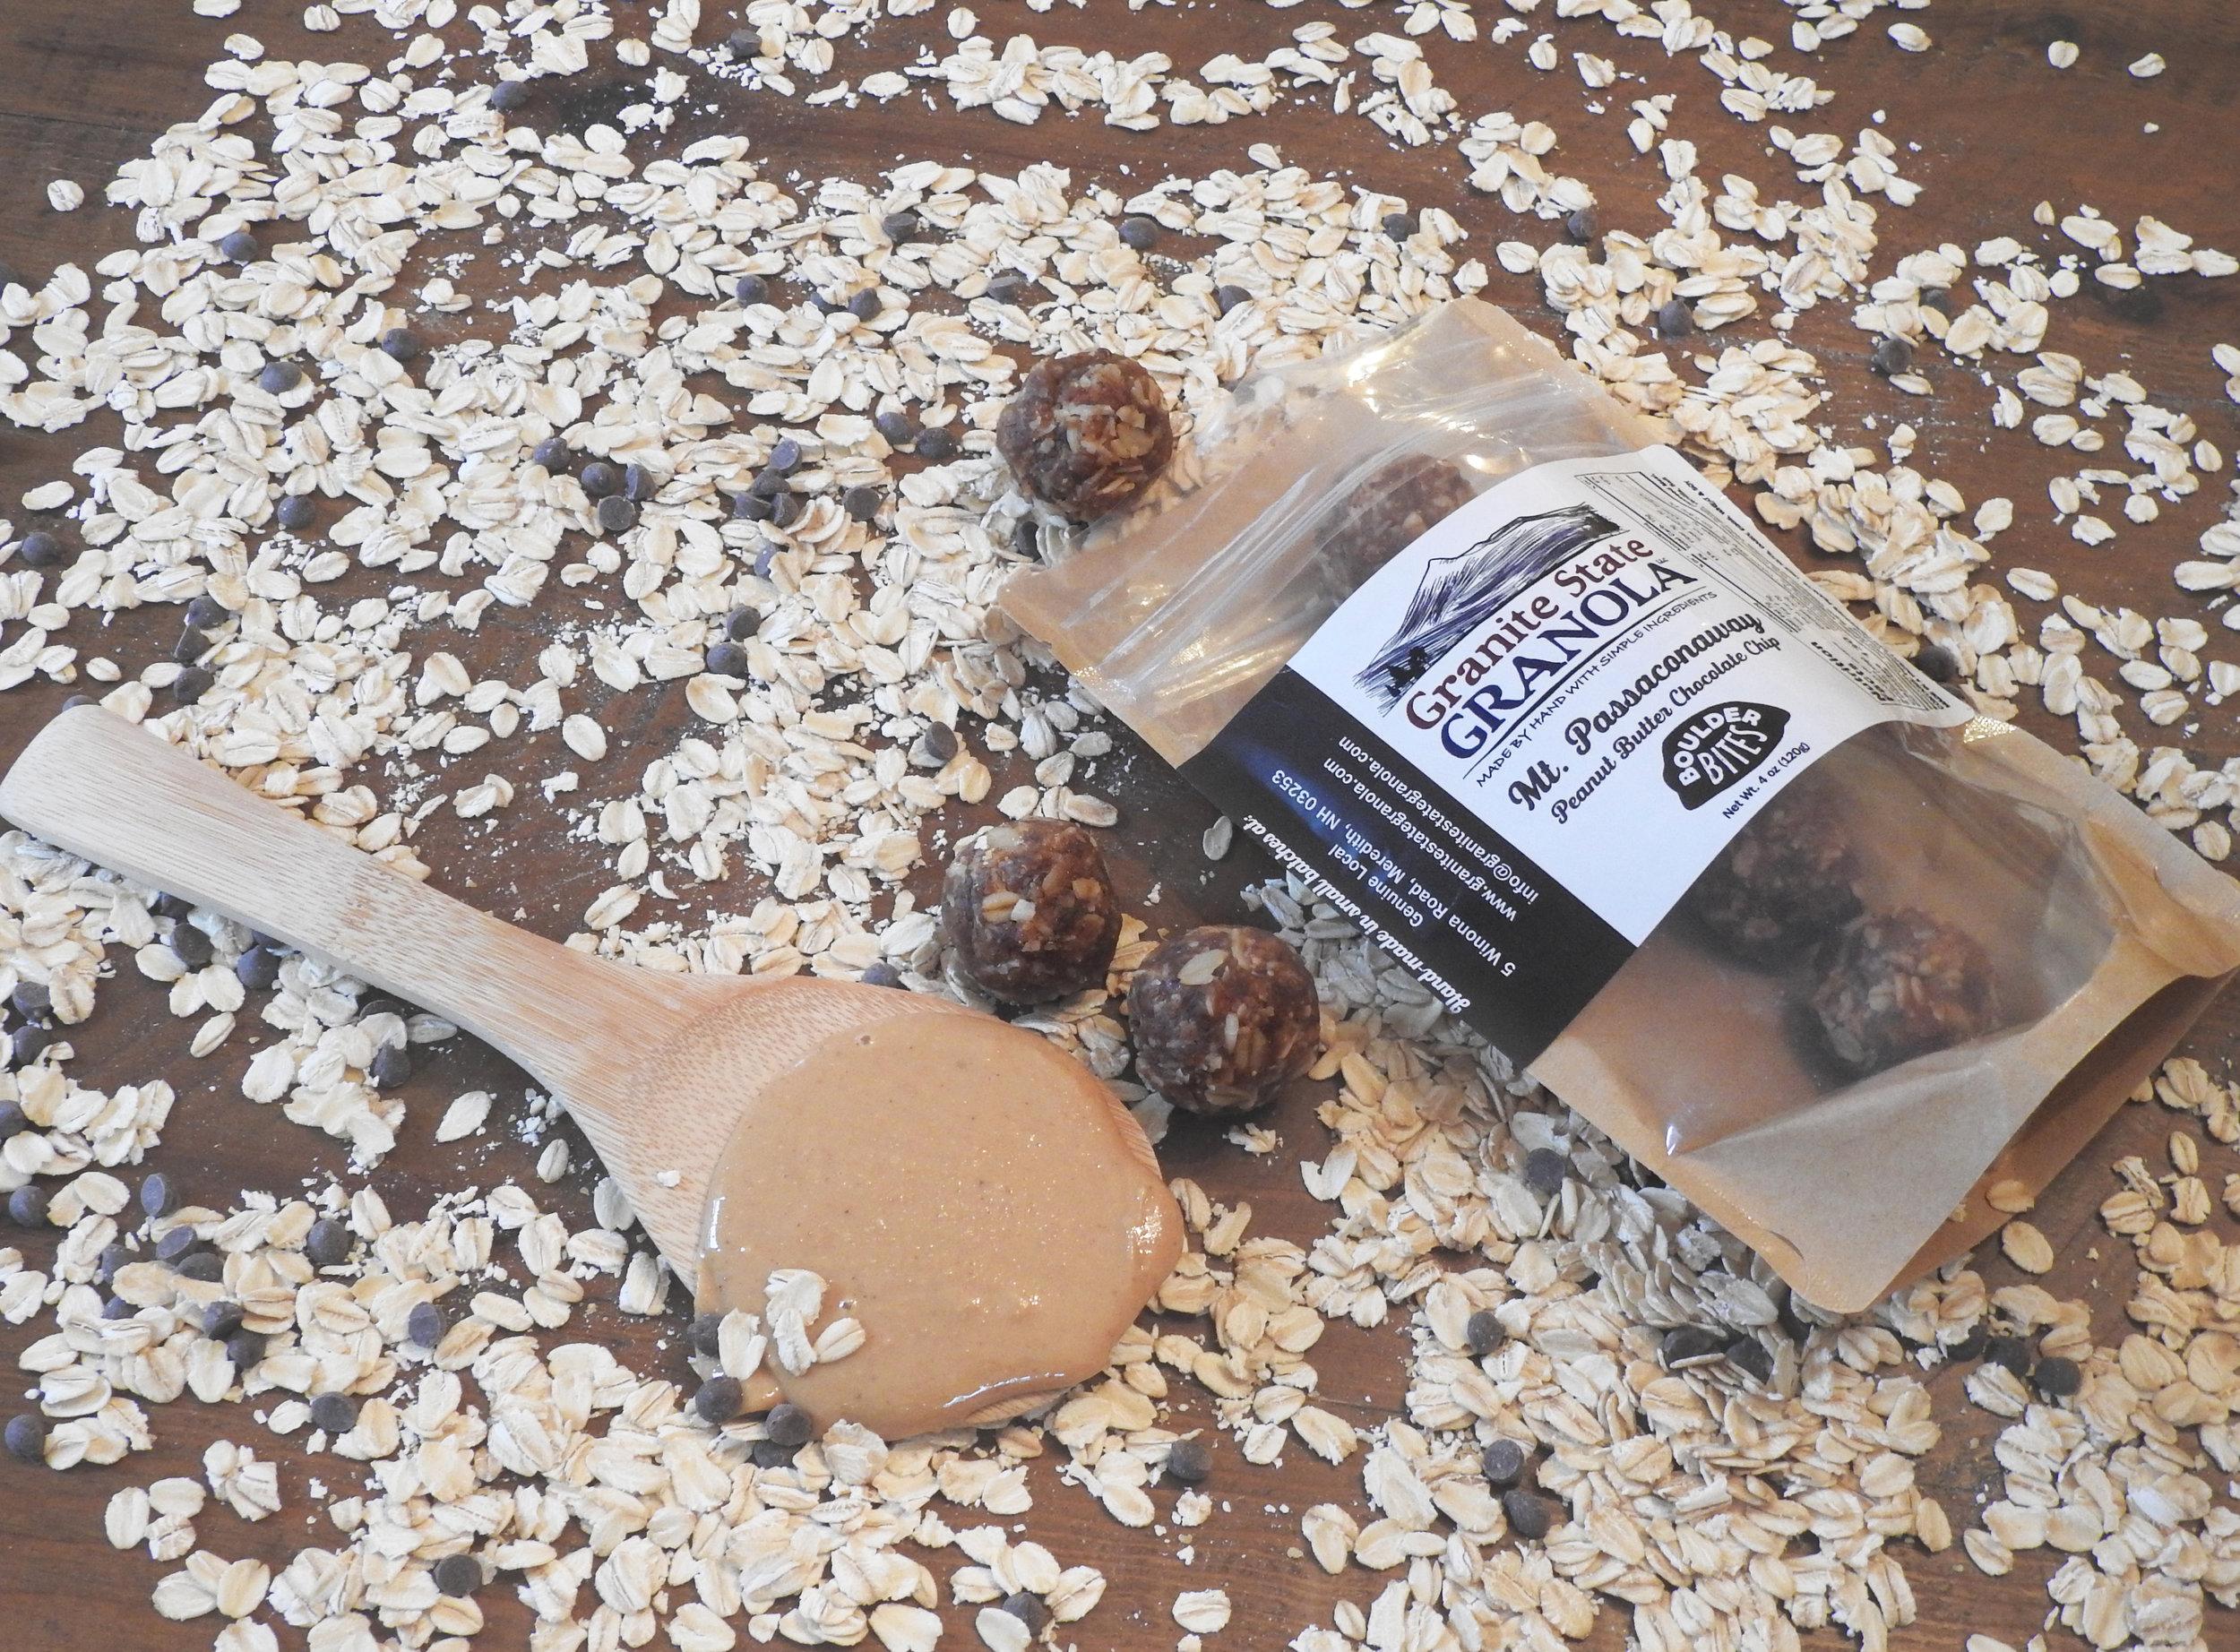 Mt. Passaconaway Peanut Butter Chocolate Chip Boulder Bites.   Photo Credit: Wendy Wetherbee